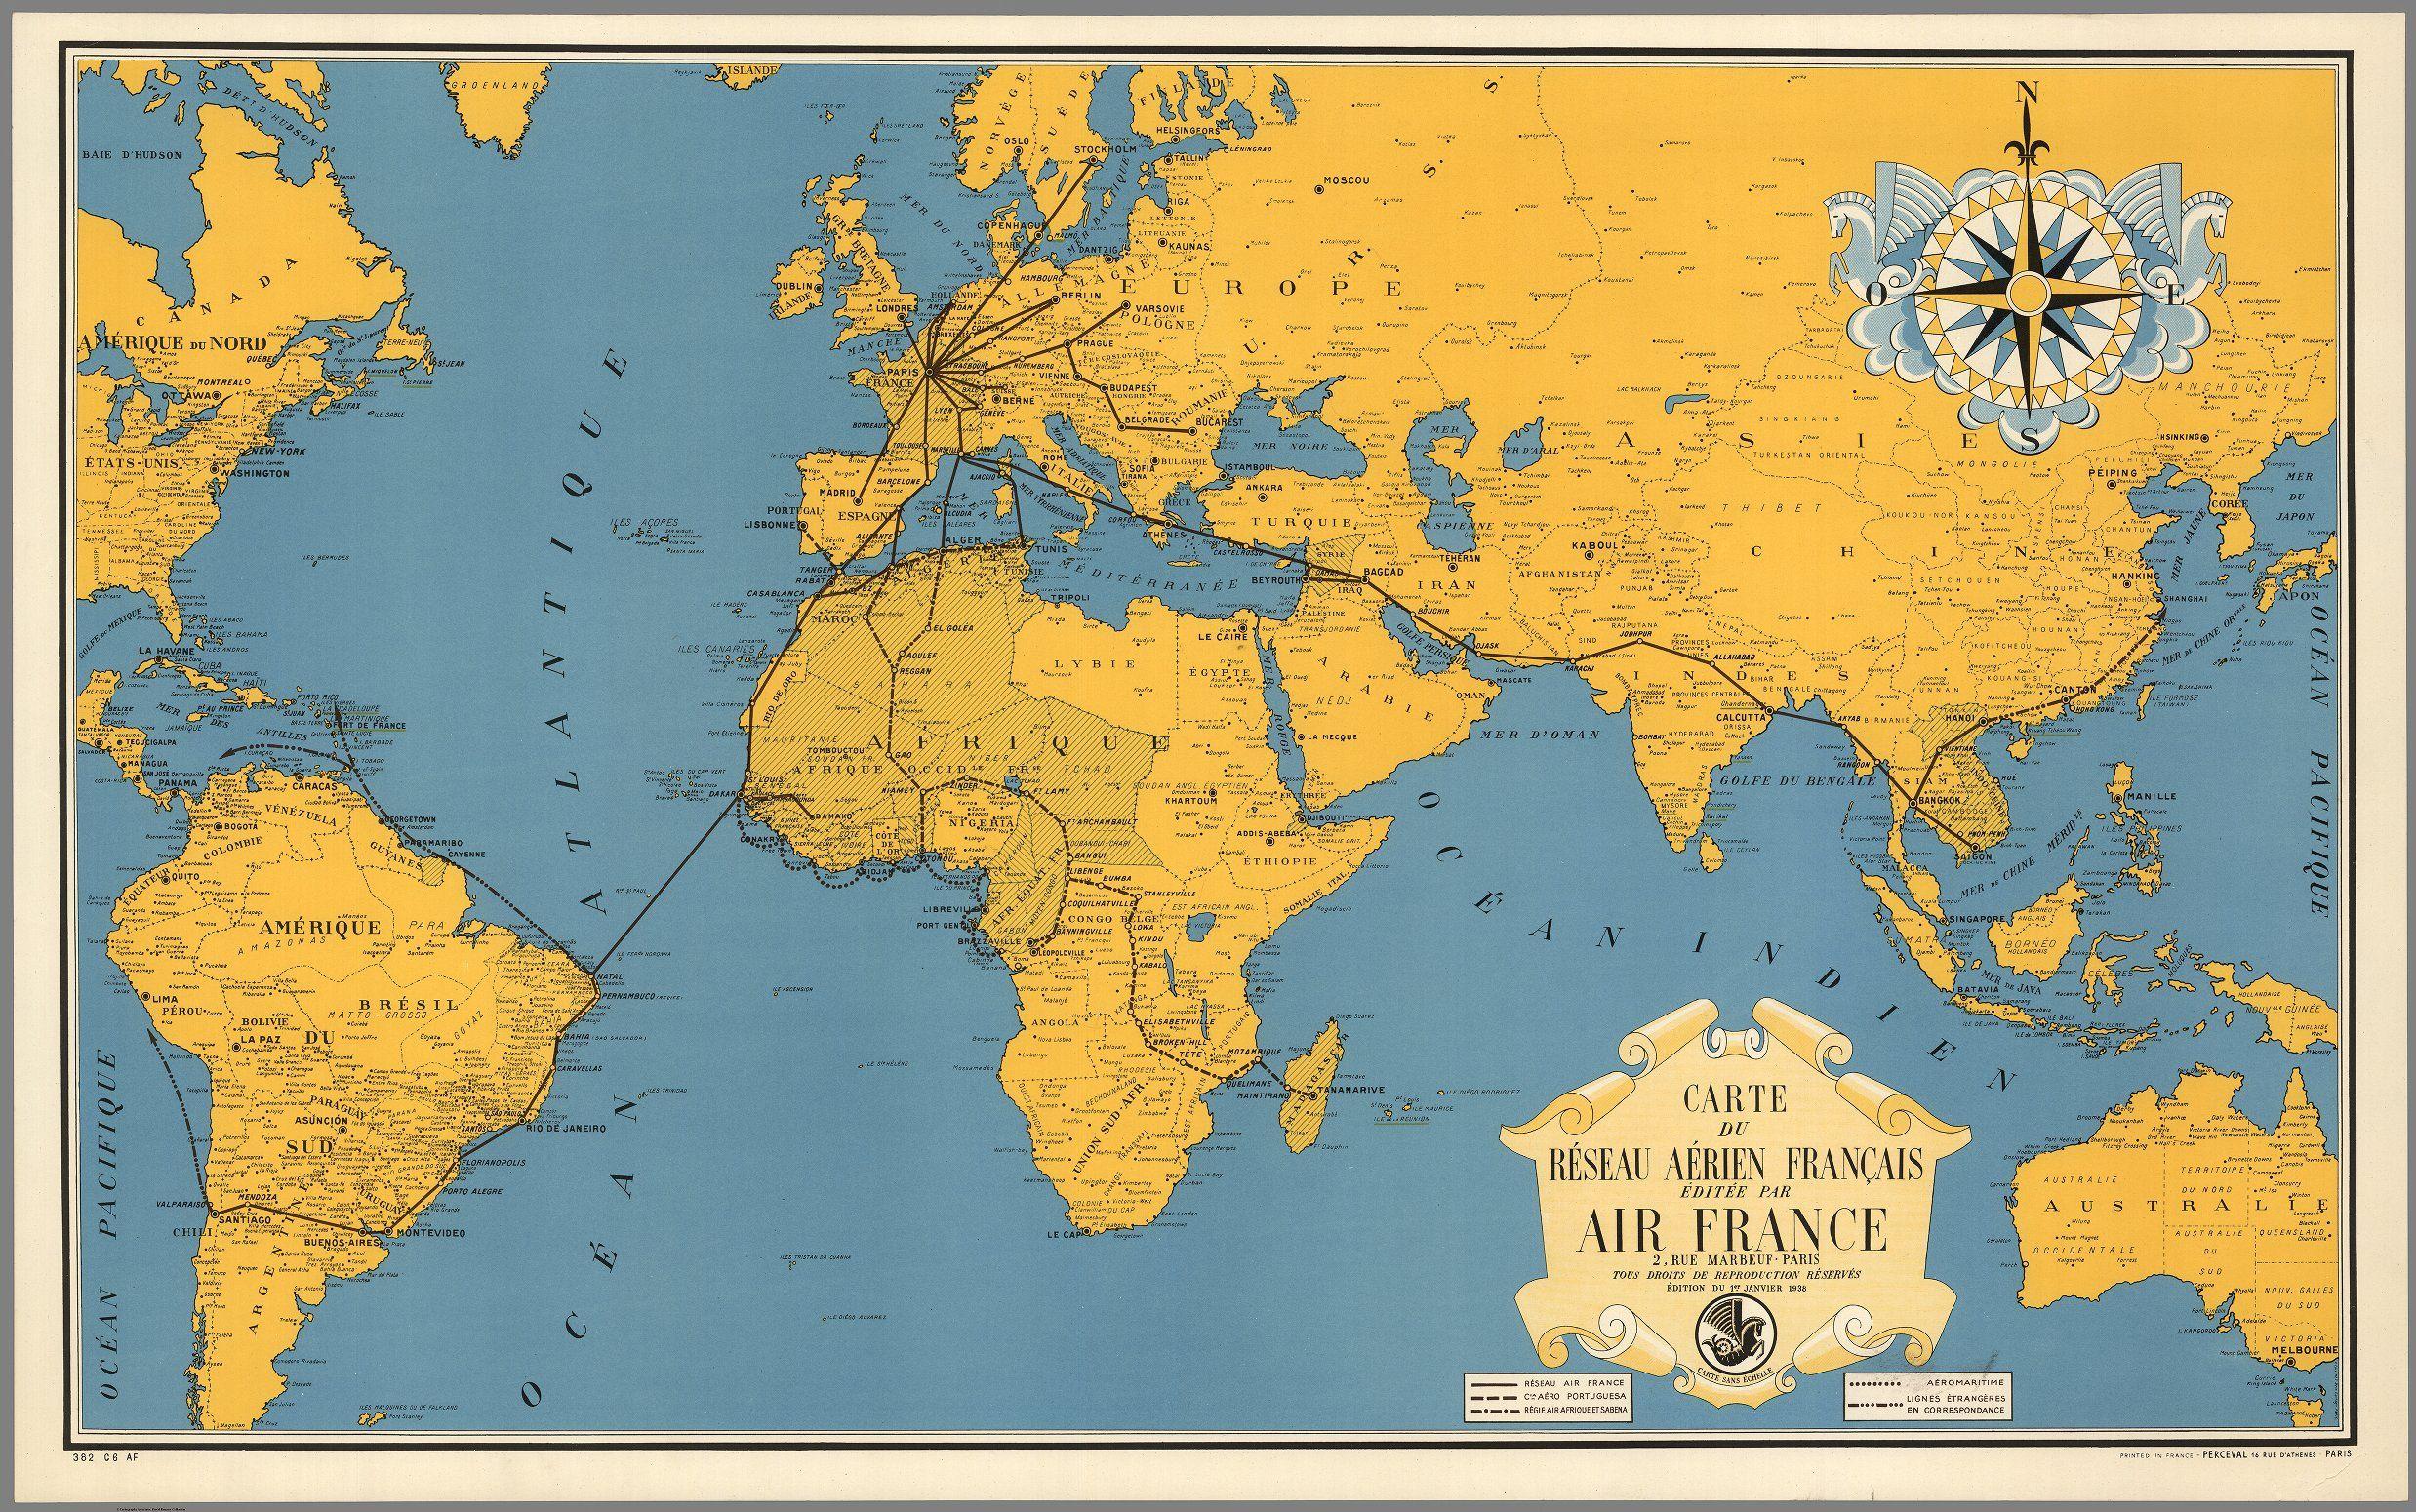 Free Printable Map Of World.20 Free Vintage Map Printable Images Remodelaholic Com Art